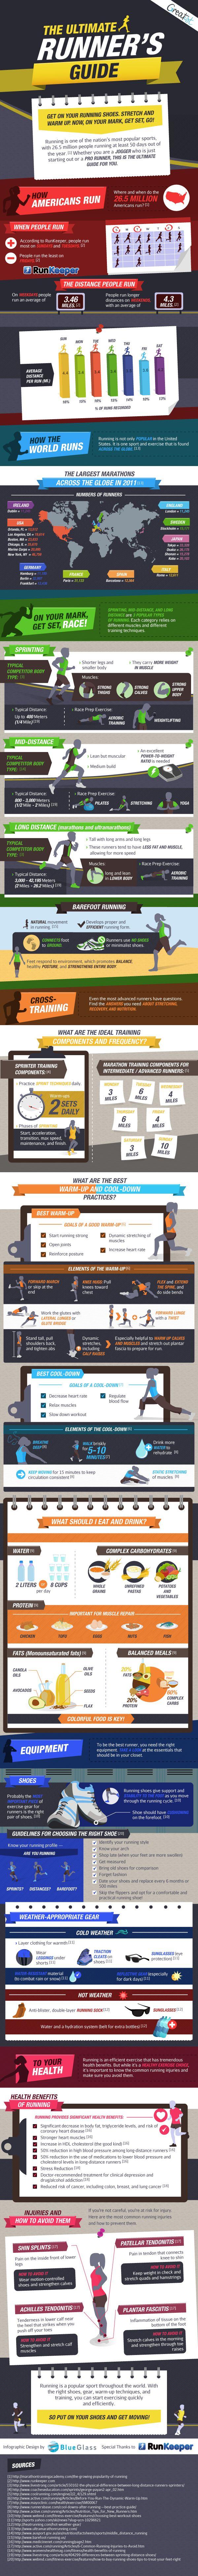 runners-guide